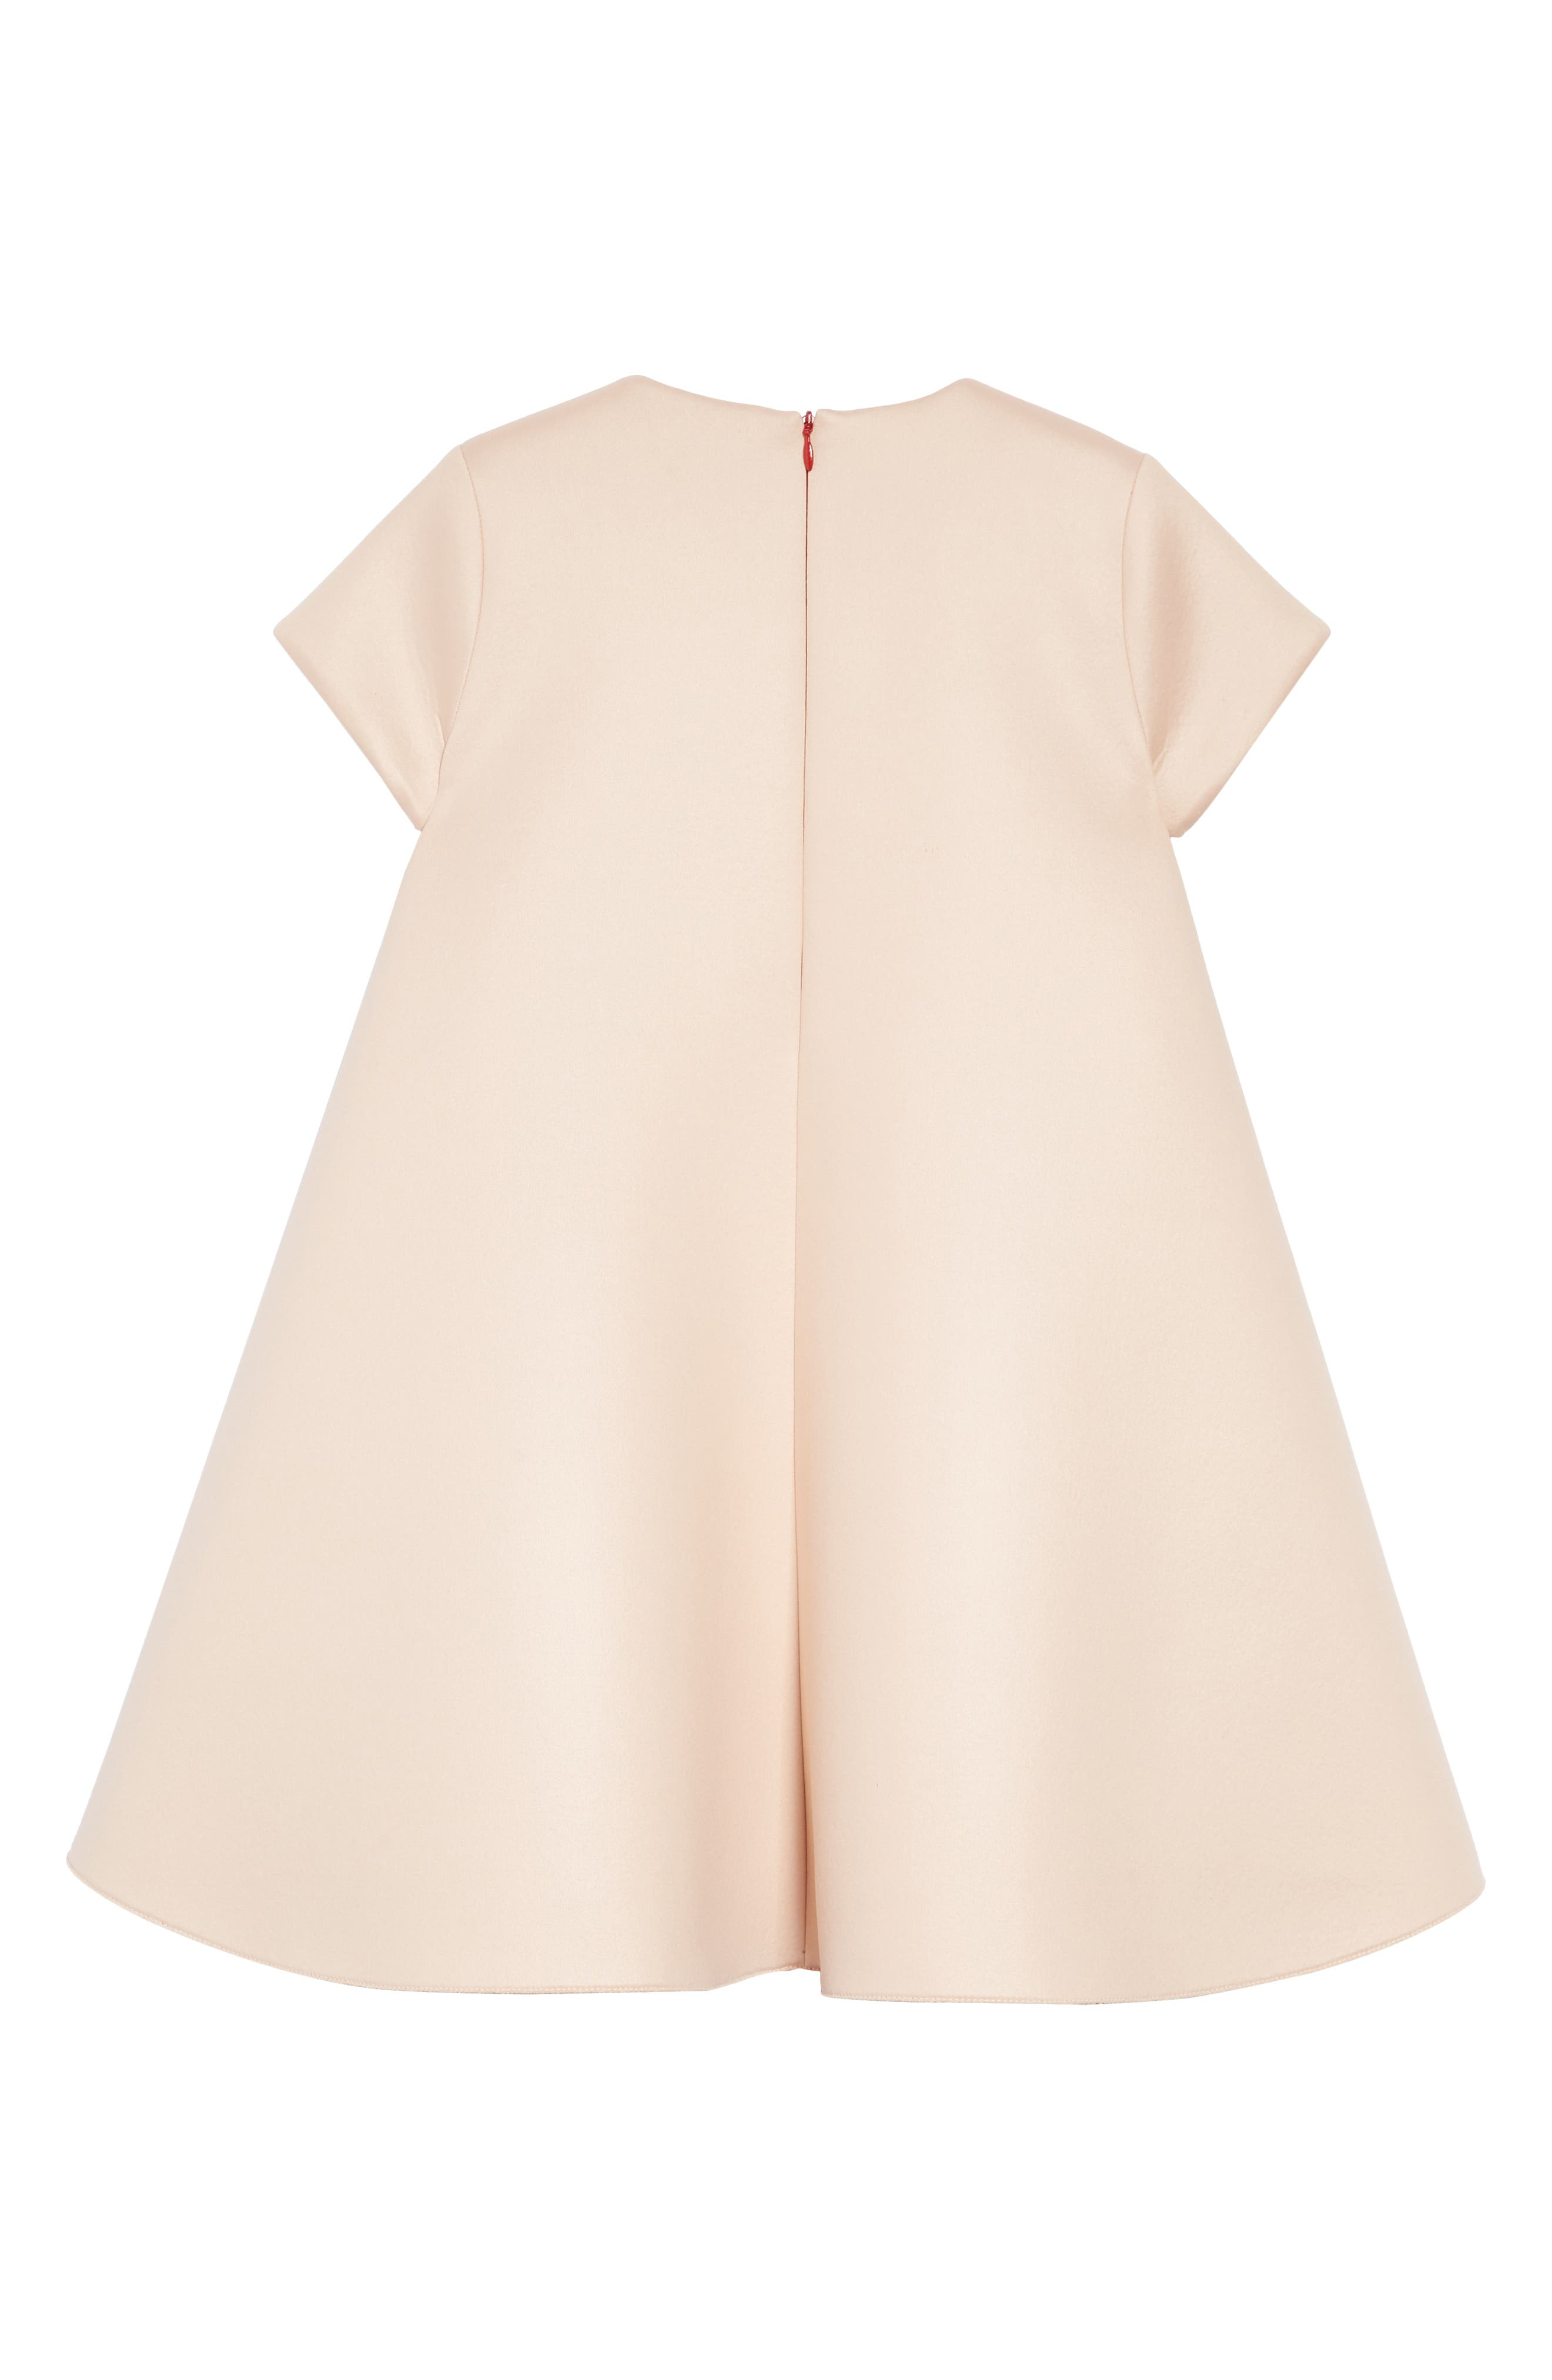 FENDI, Bow Detail Dress, Alternate thumbnail 2, color, F0JE6 PEACH